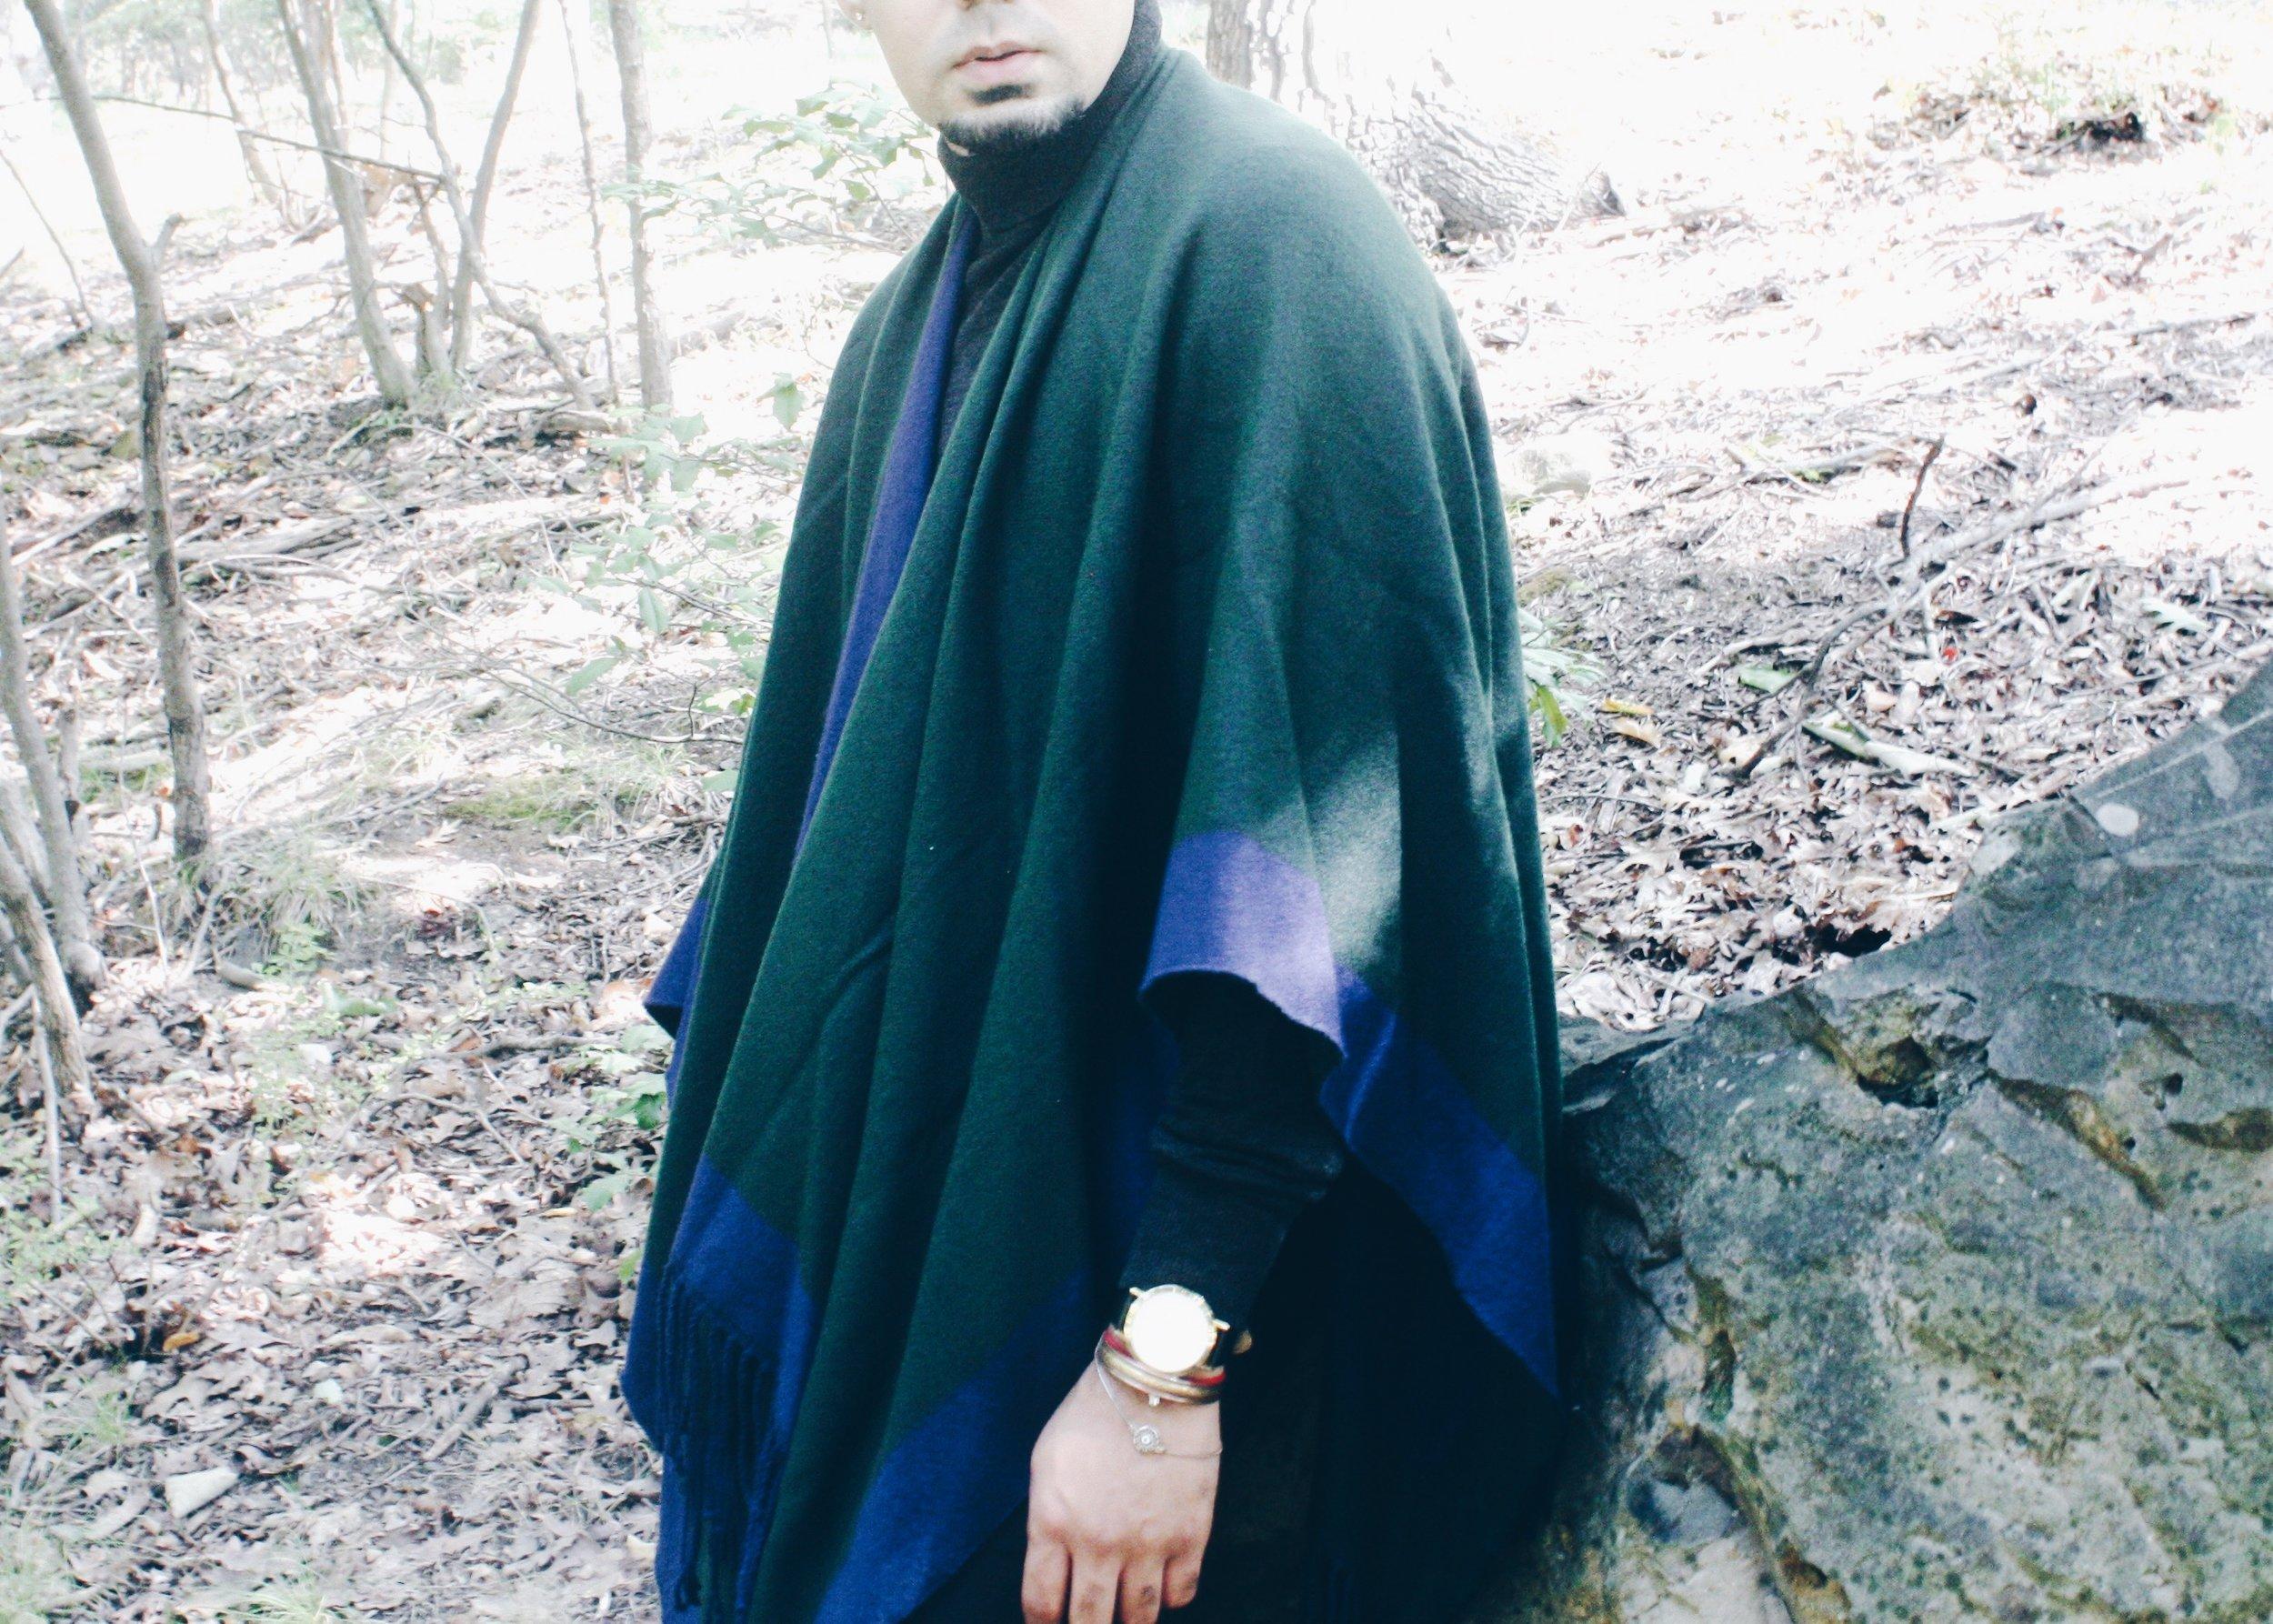 sam-c-perry-5-fabrics-you-need-in-your-winter-wardrobe-main.jpg